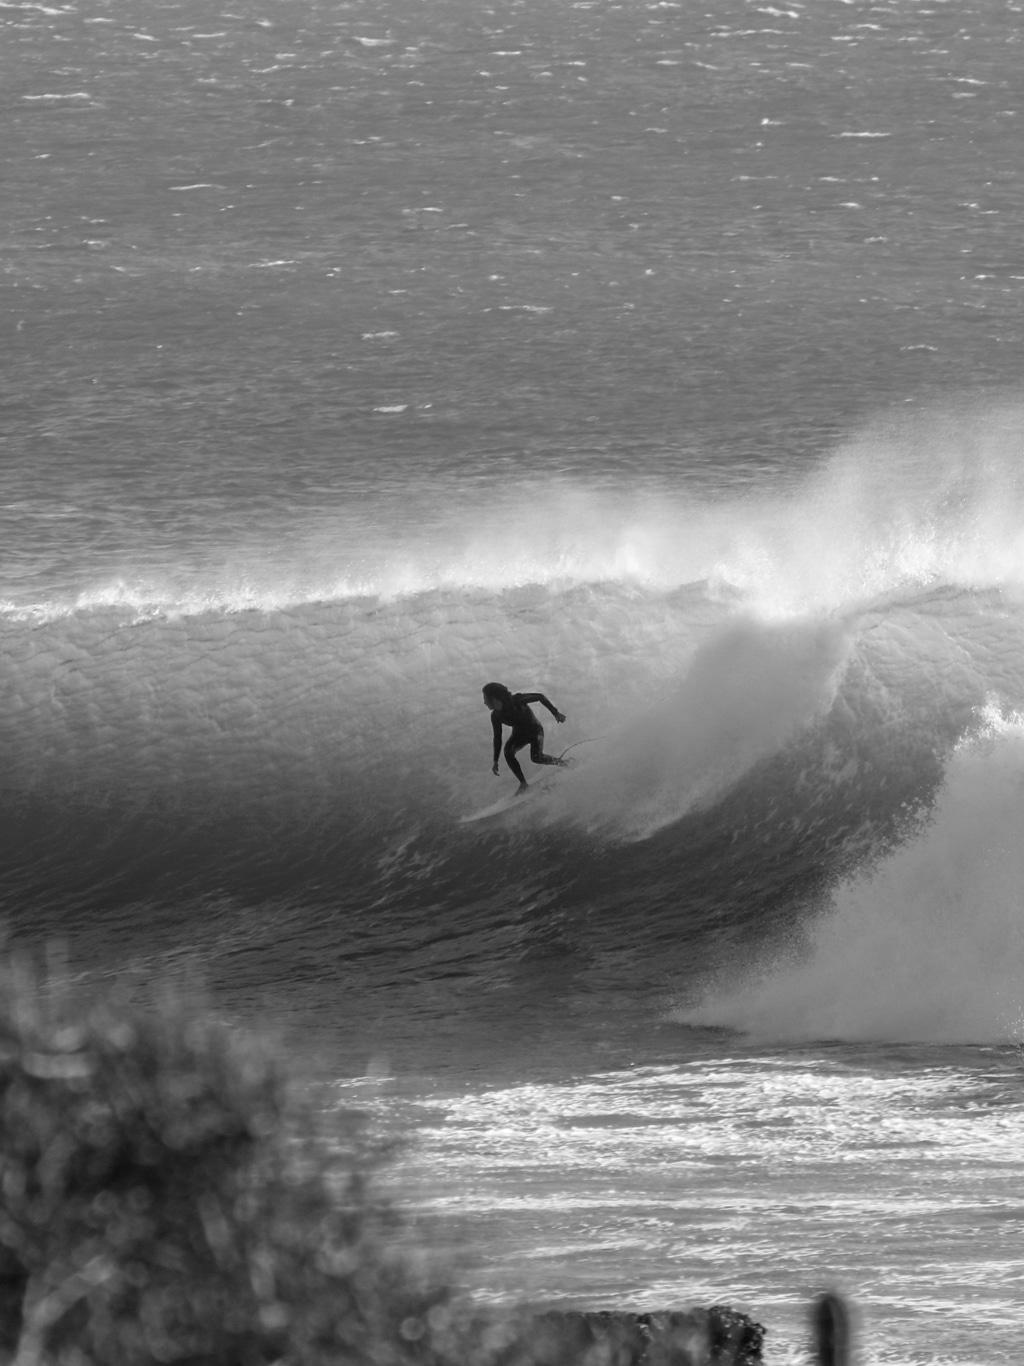 The Yogi Surfer